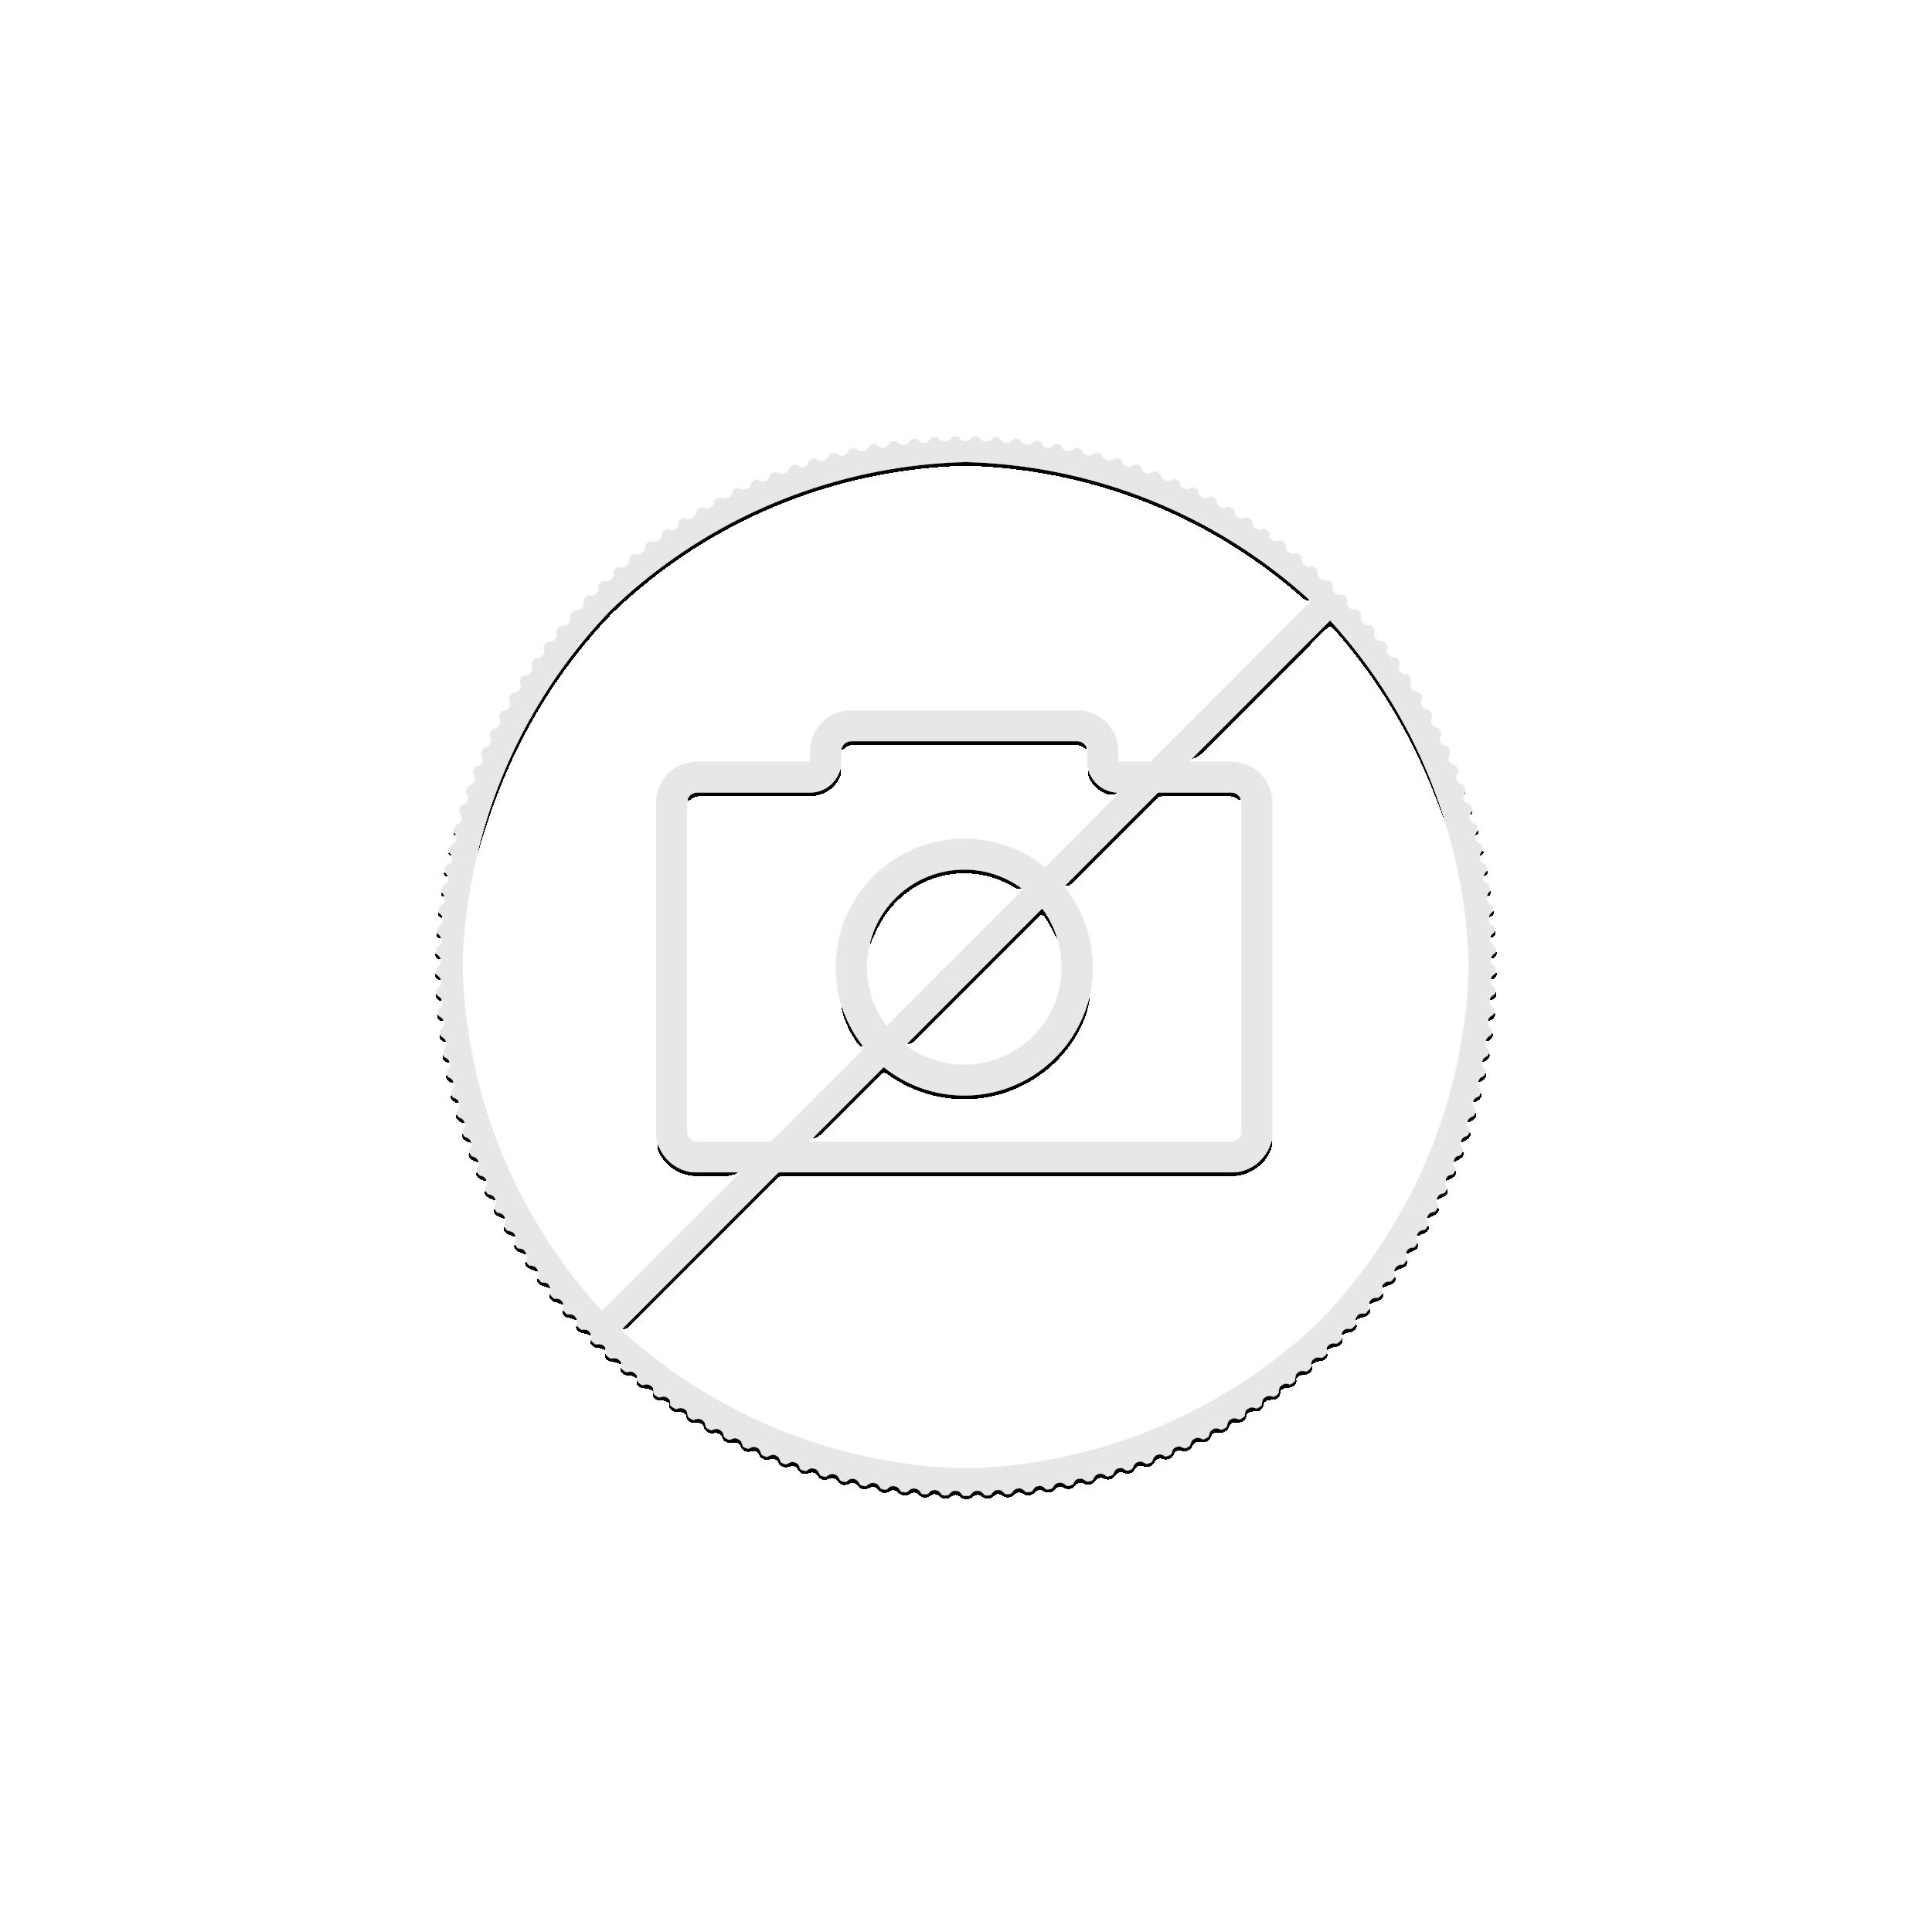 1/2 troy ounce silver coin motherhood 2021 Proof